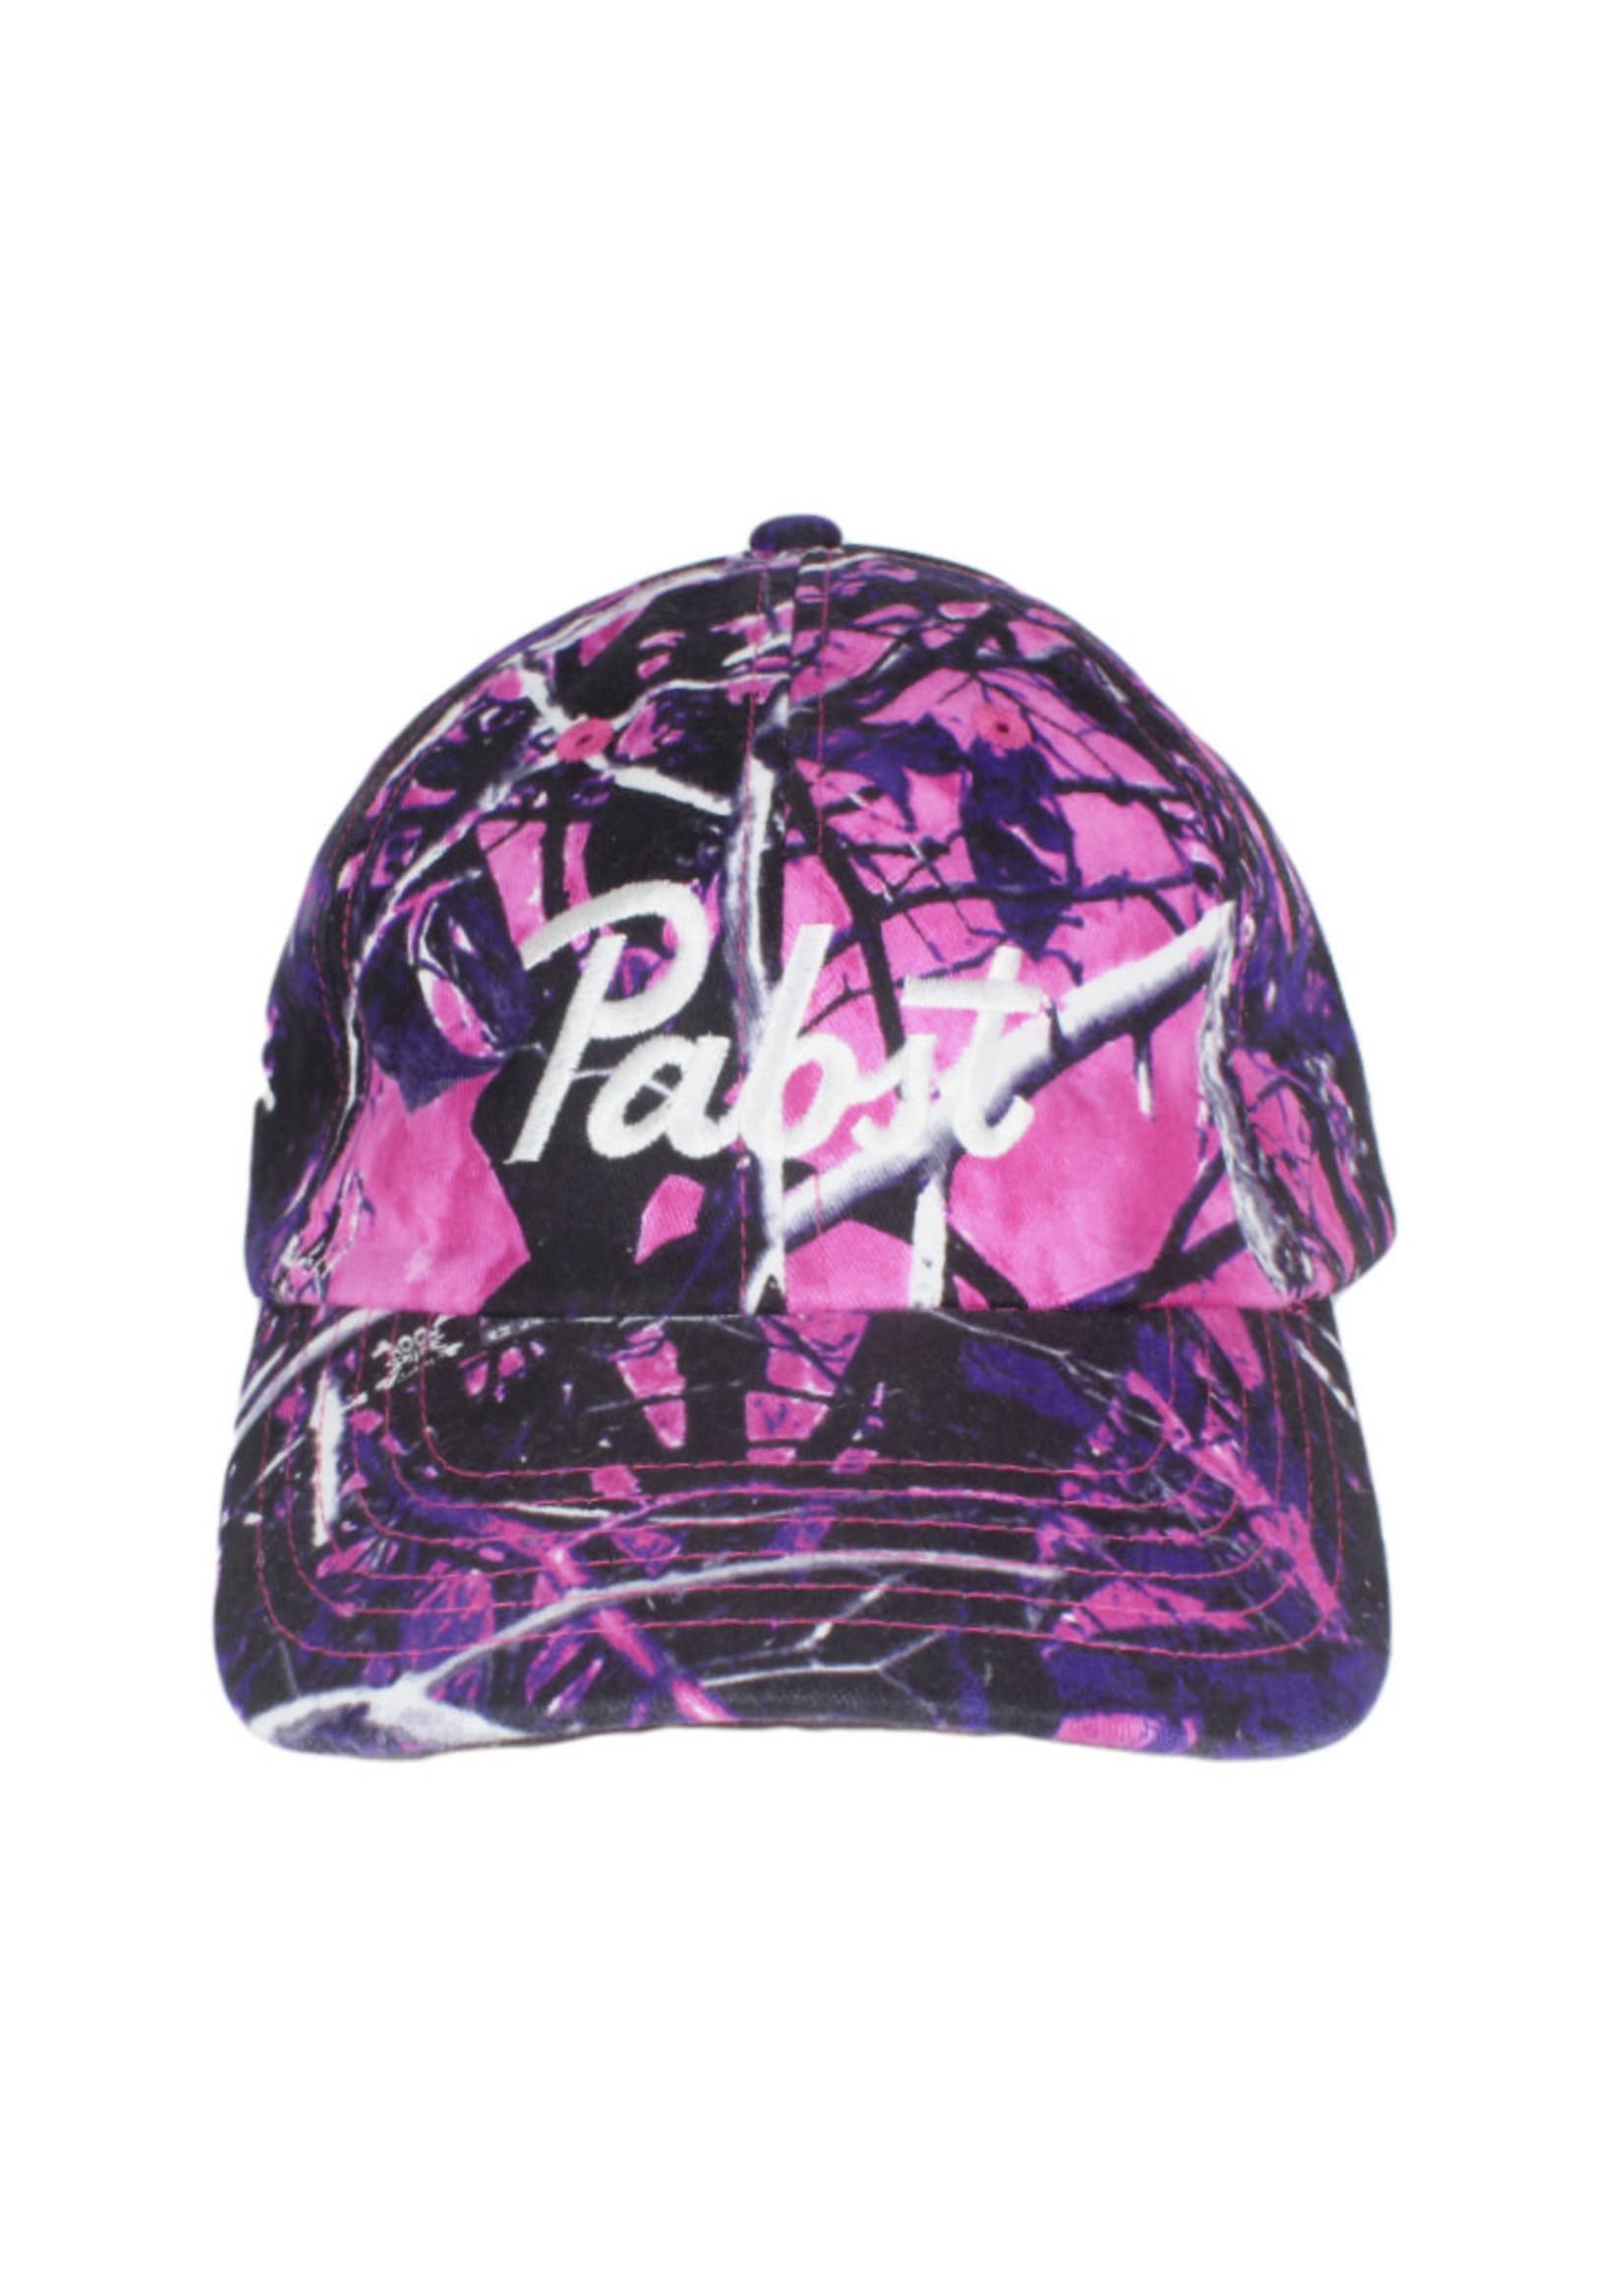 Pabst Pabst Pink Camo Cap